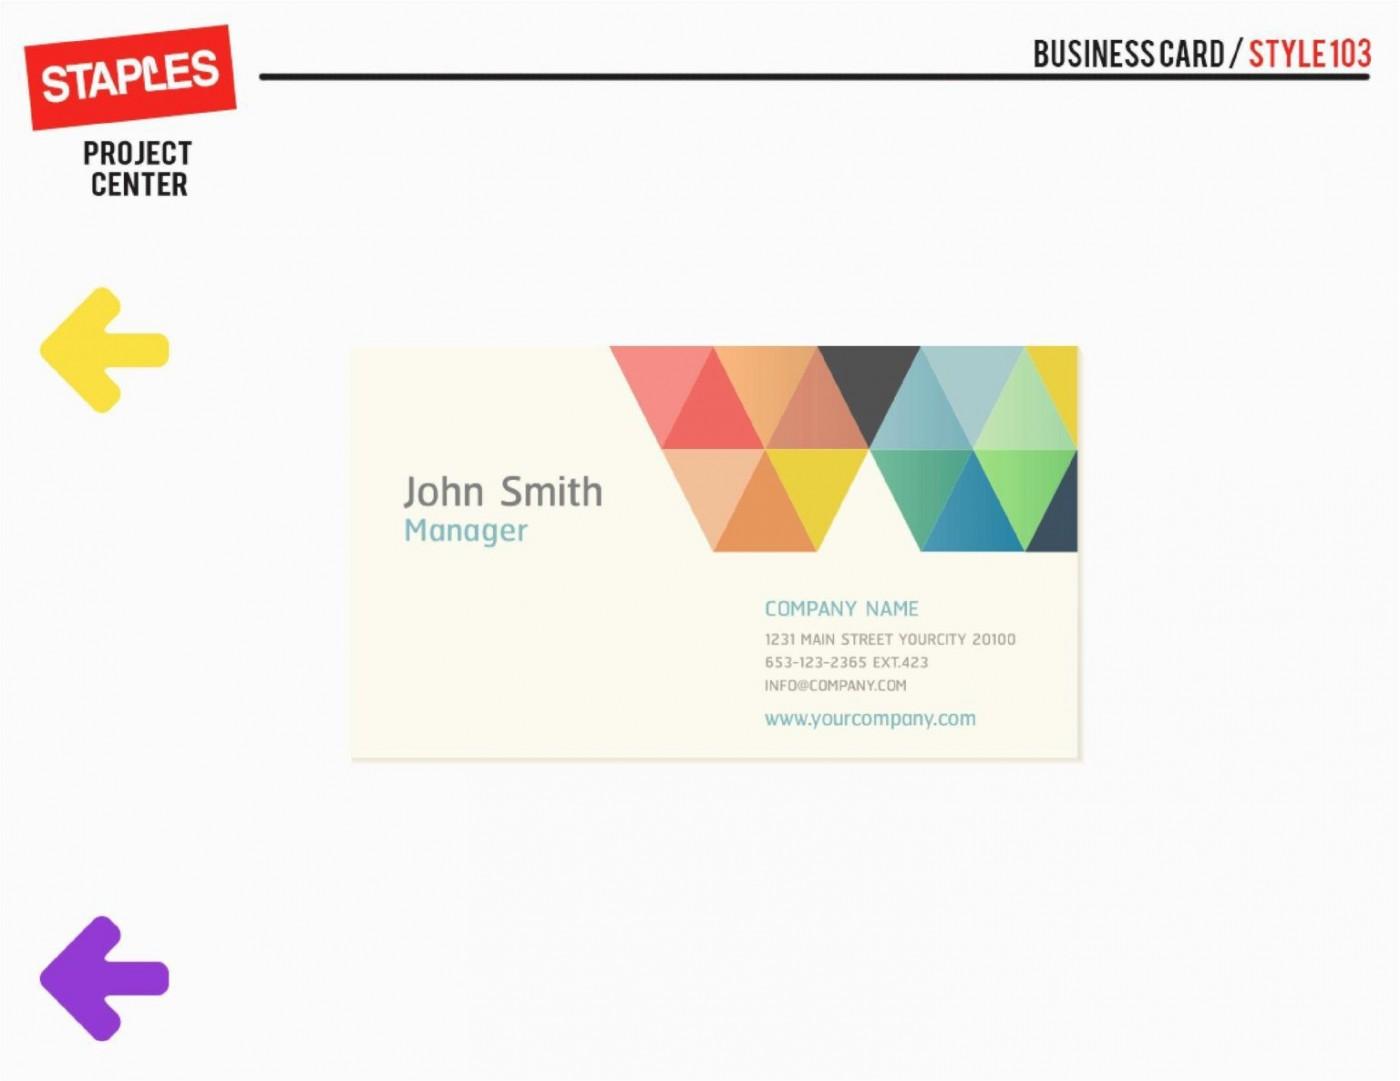 002 Dreaded Staple Busines Card Template Idea  Word Brand Heavyweight1400